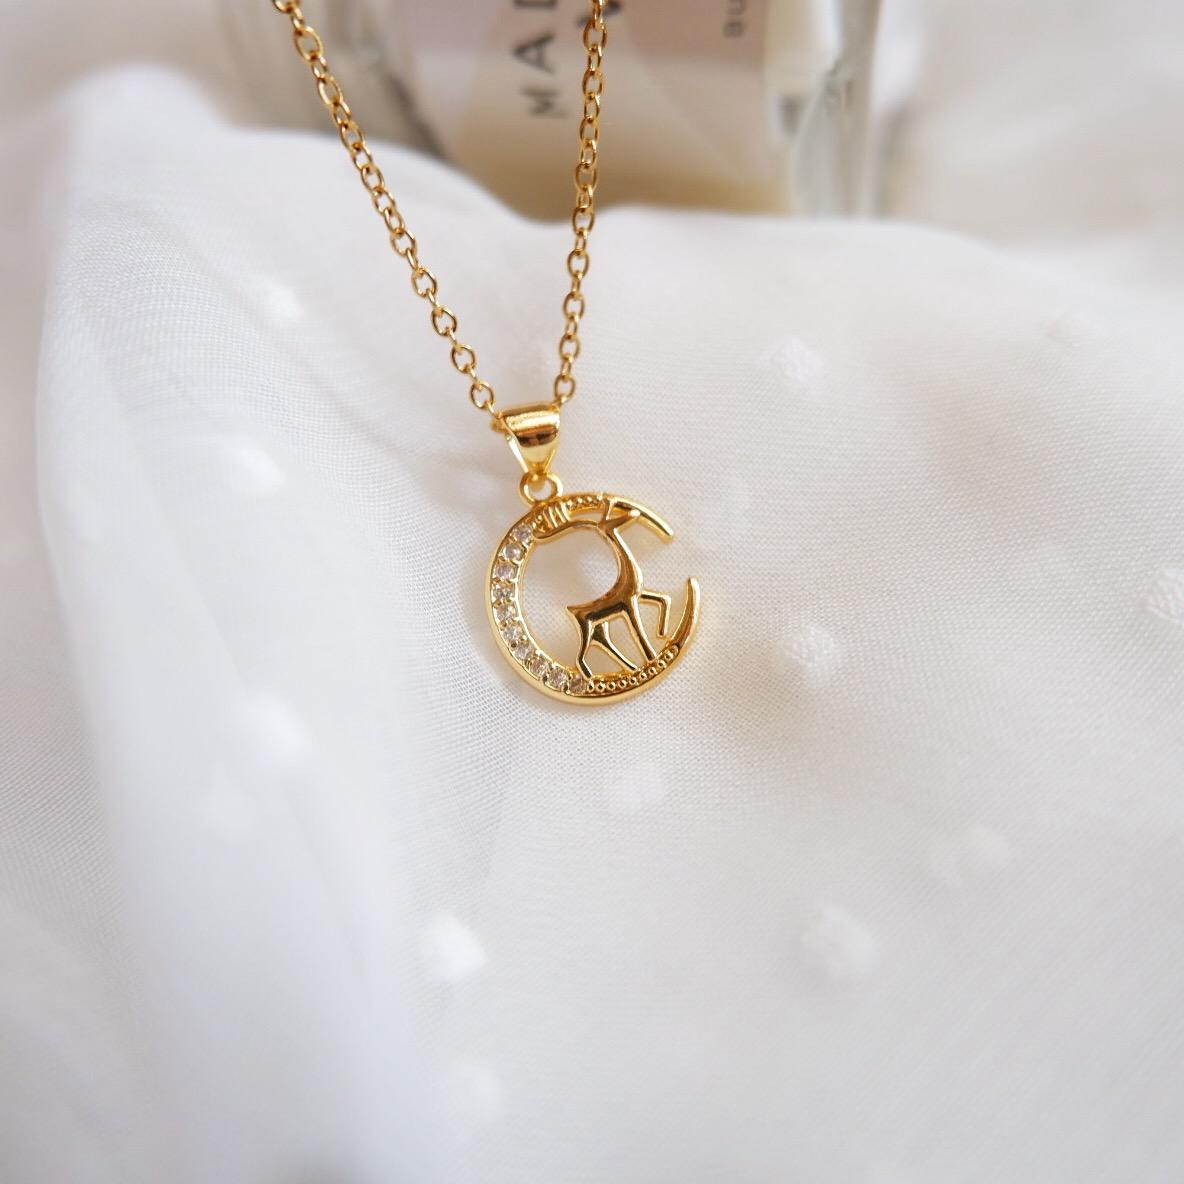 Raine-Necklace-1.jpeg